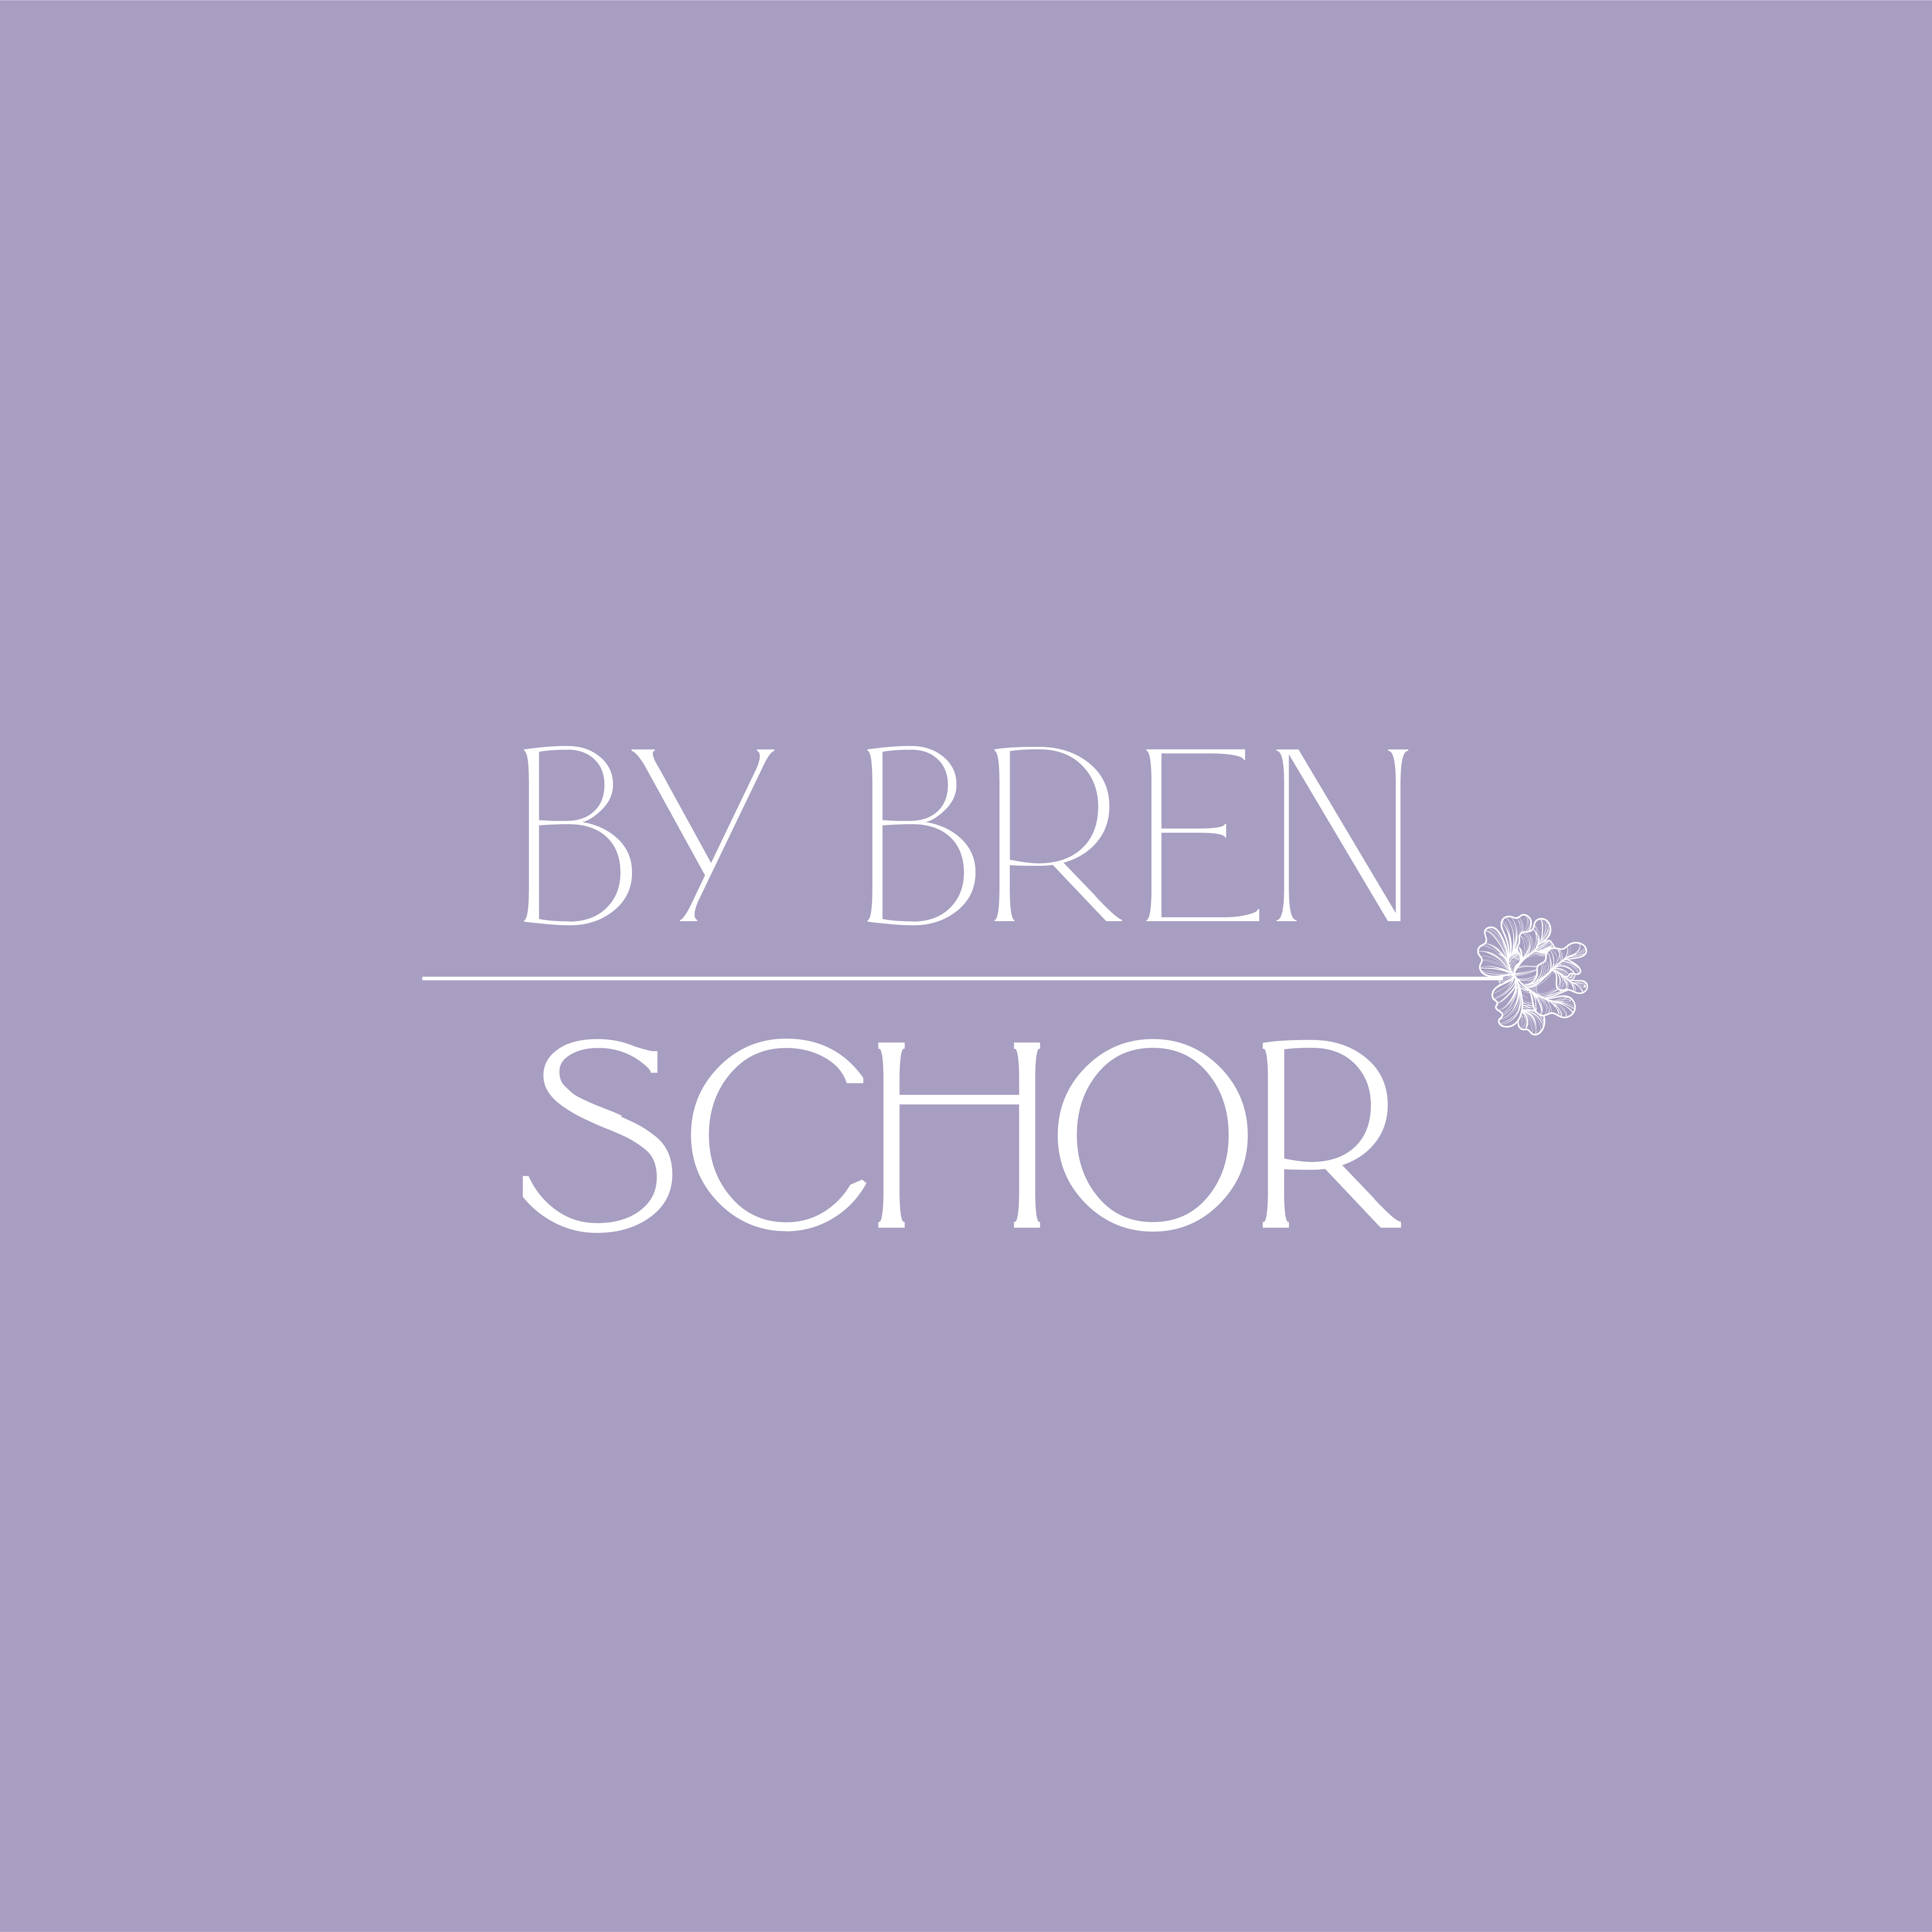 By Bren Schor